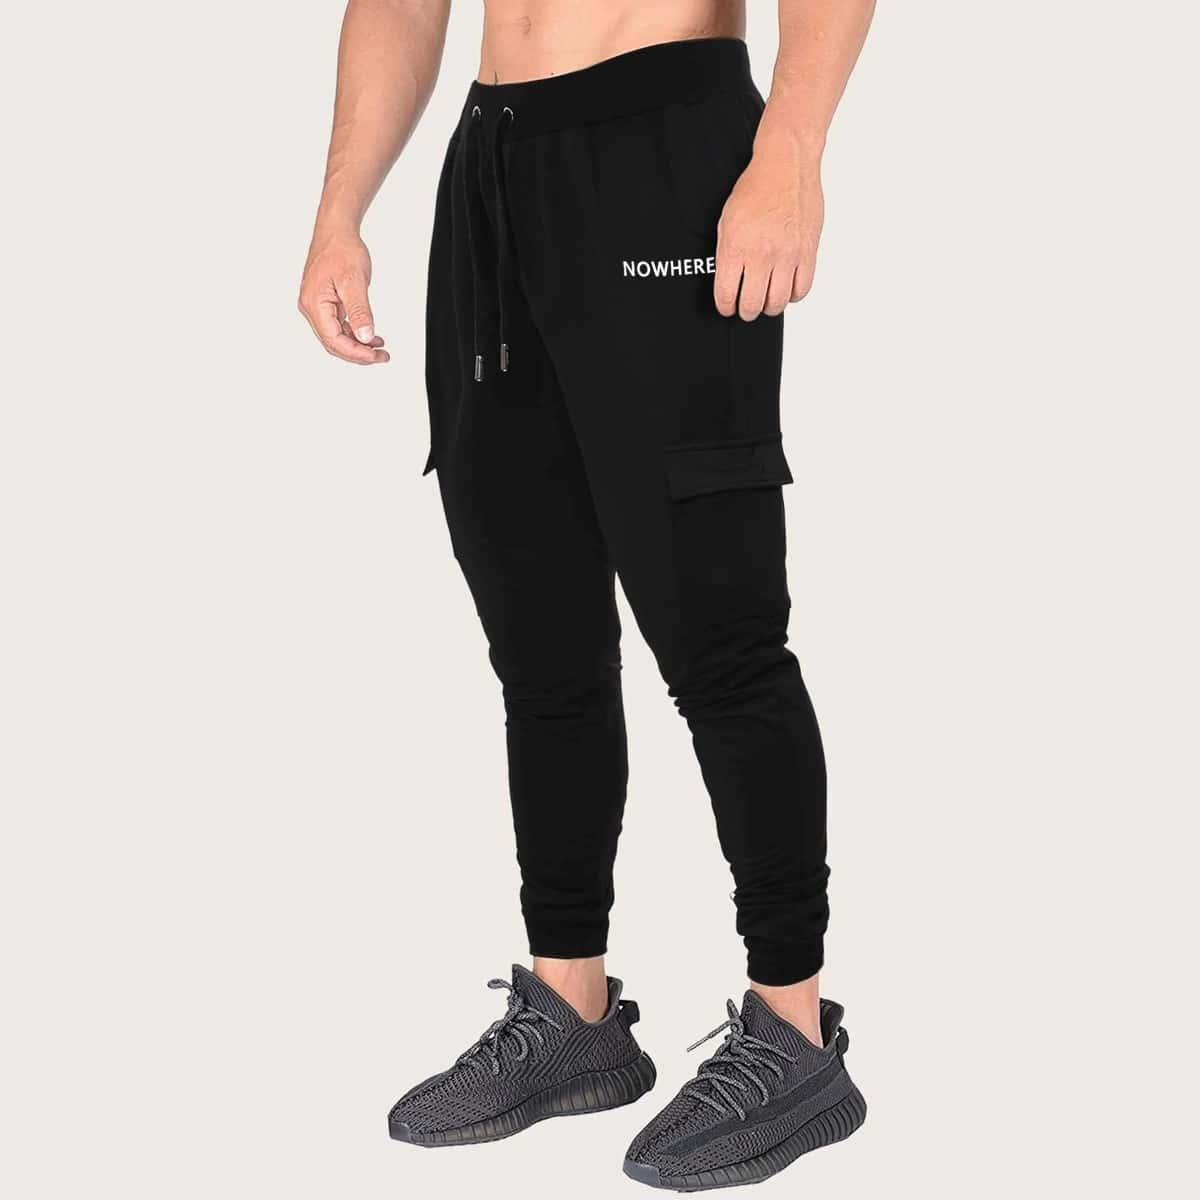 на кулиске буква Мужские спортивные брюки по цене 1 510